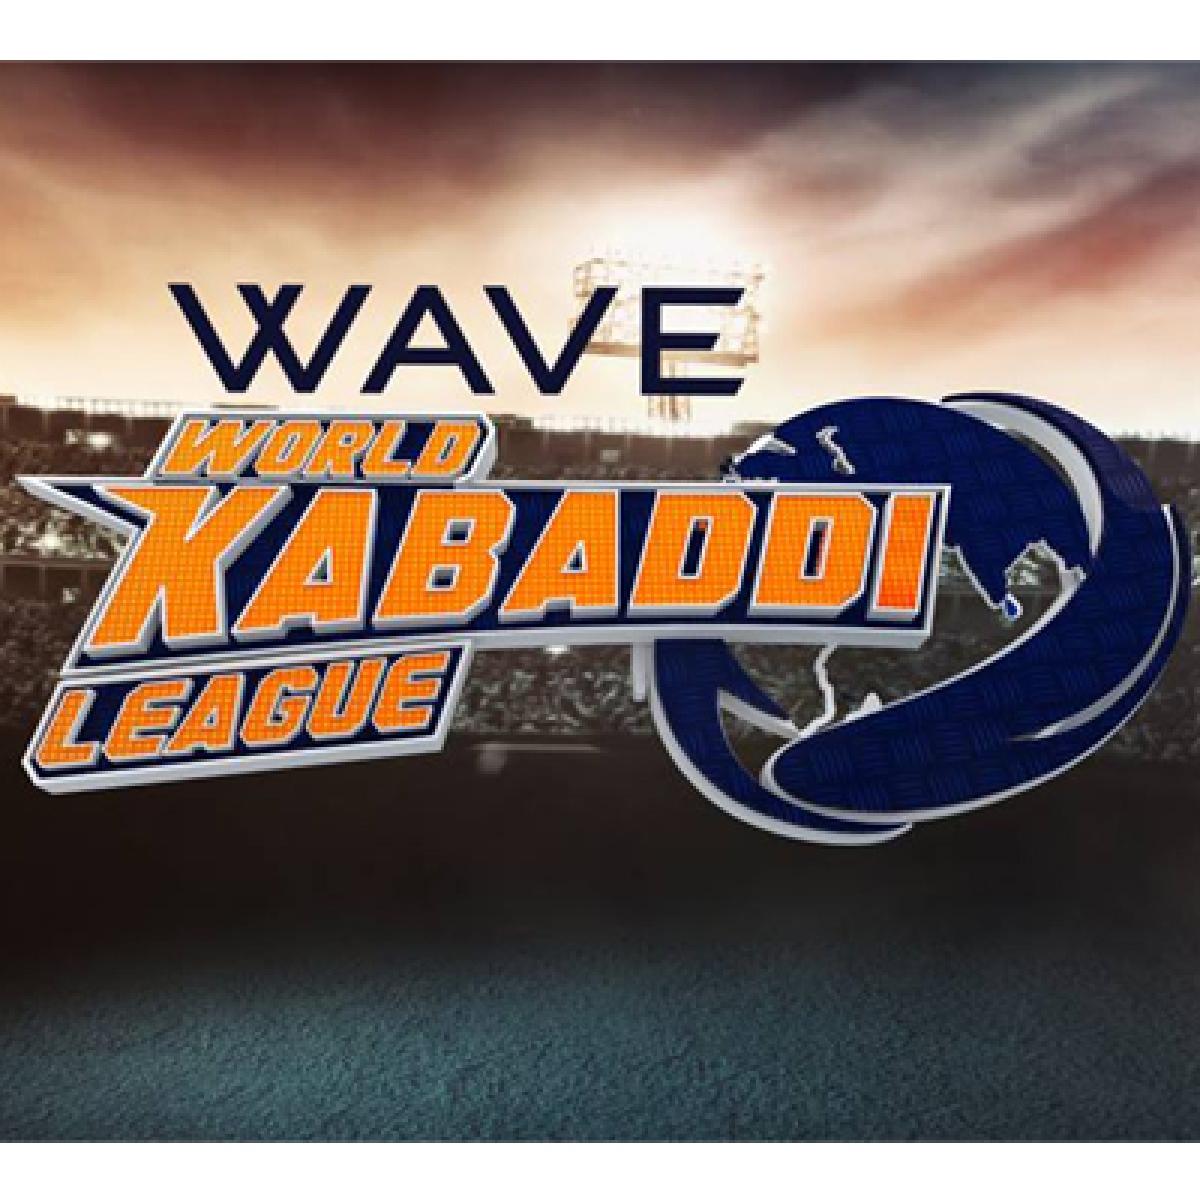 World Kabaddi League in top-5 sporting properties